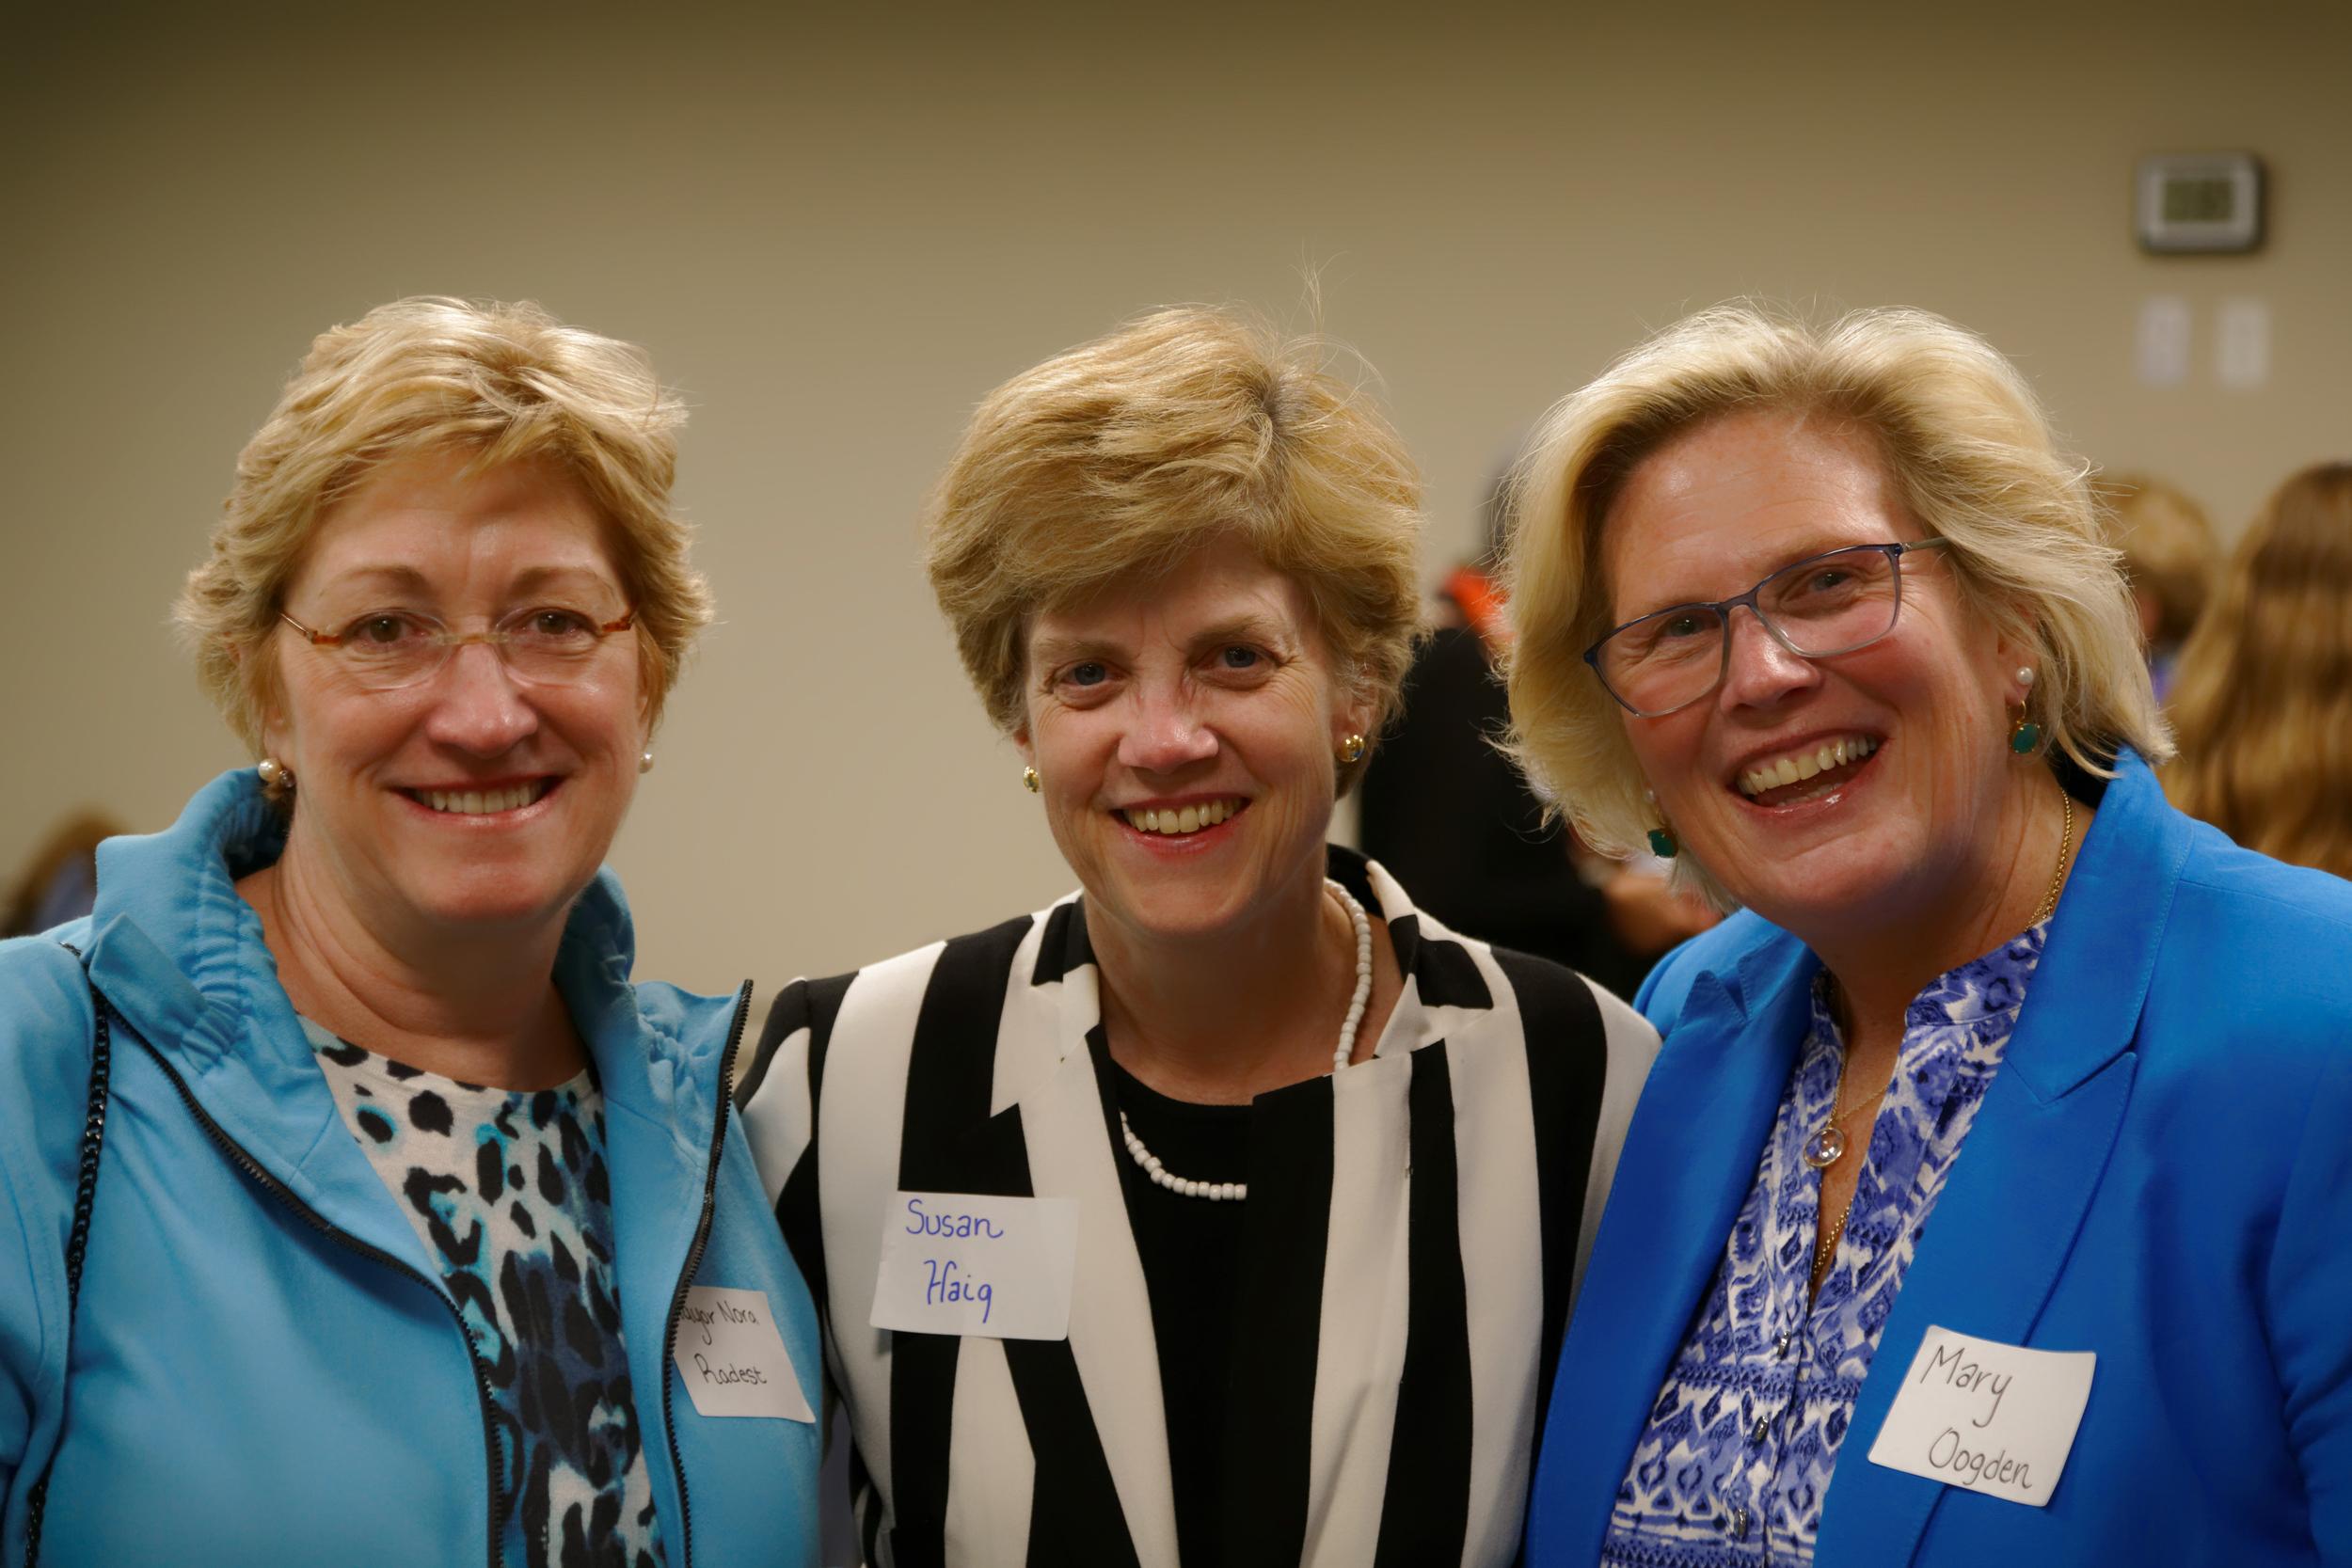 Summit Mayor Nora Radest; CivicStory Founder Susan Haig, Summit City Councillor Mary Ogden